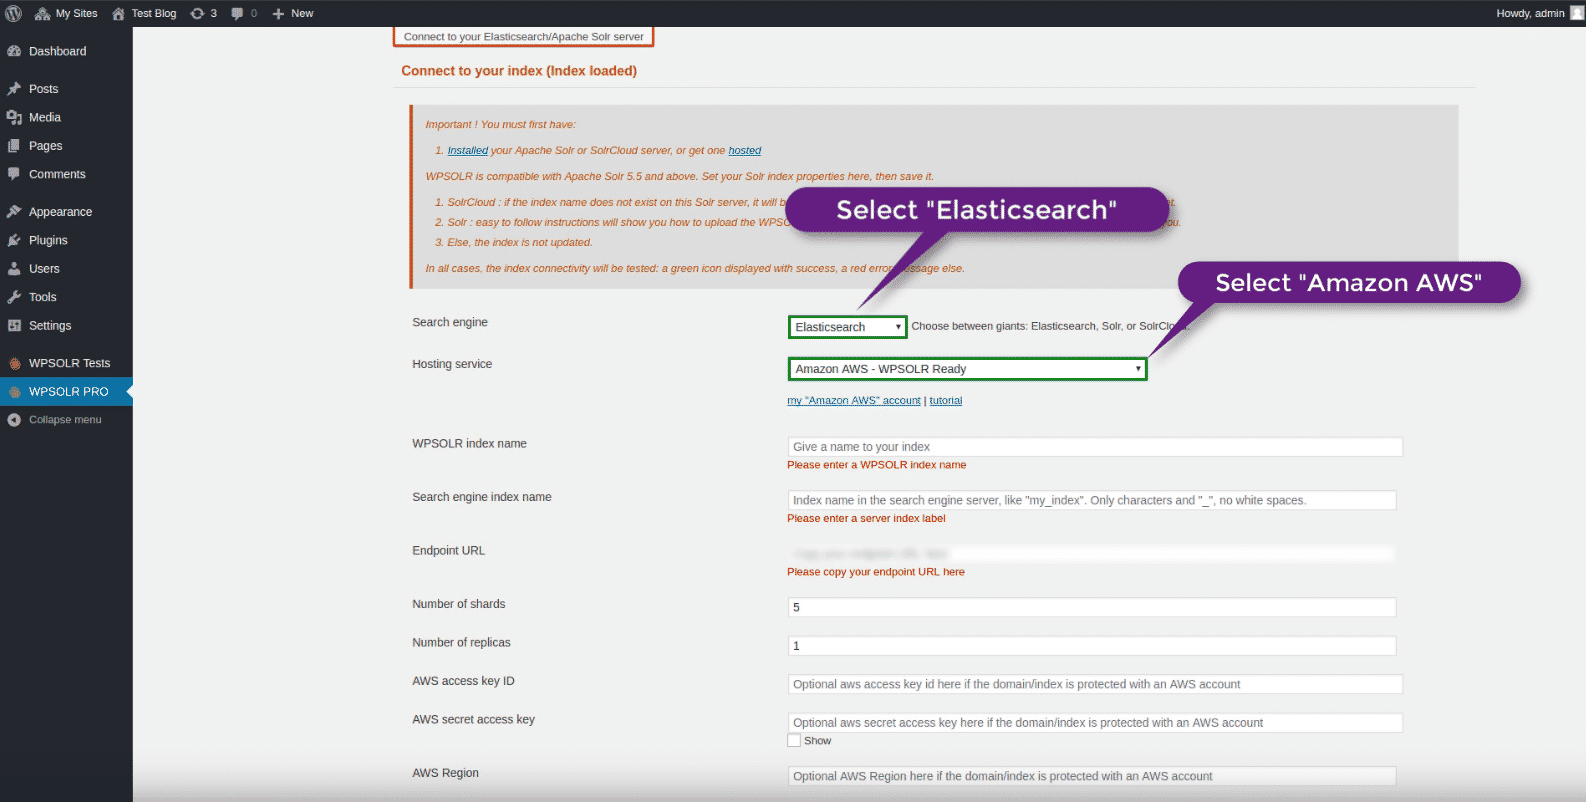 WPSOLR Amazon index: select Amazon hosting